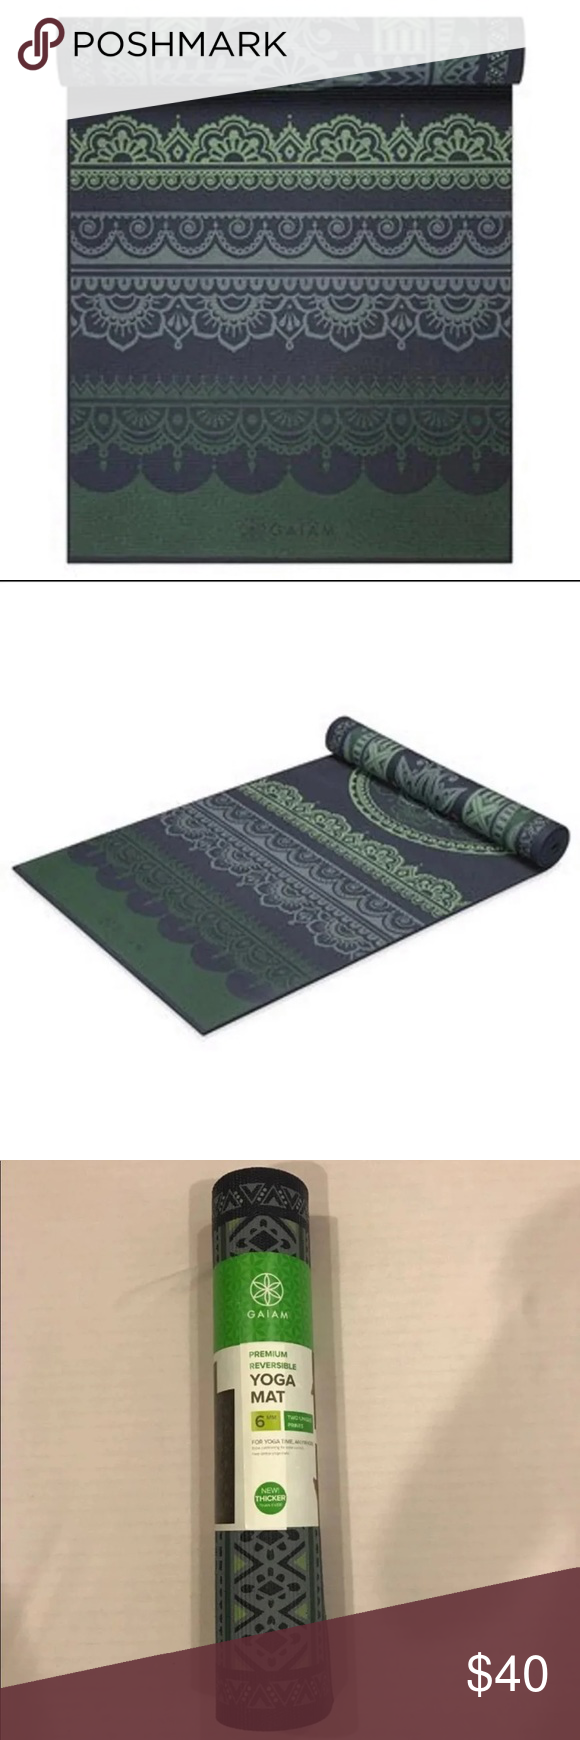 Gaiam 6mm Boho Folk Reversible Yoga Mat Gaiam 6mm Boho Folk Reversible Yoga Mat Product Features Premium 6mm Thickness Mat Offers Cushion Gaiam Yoga Mat Boho